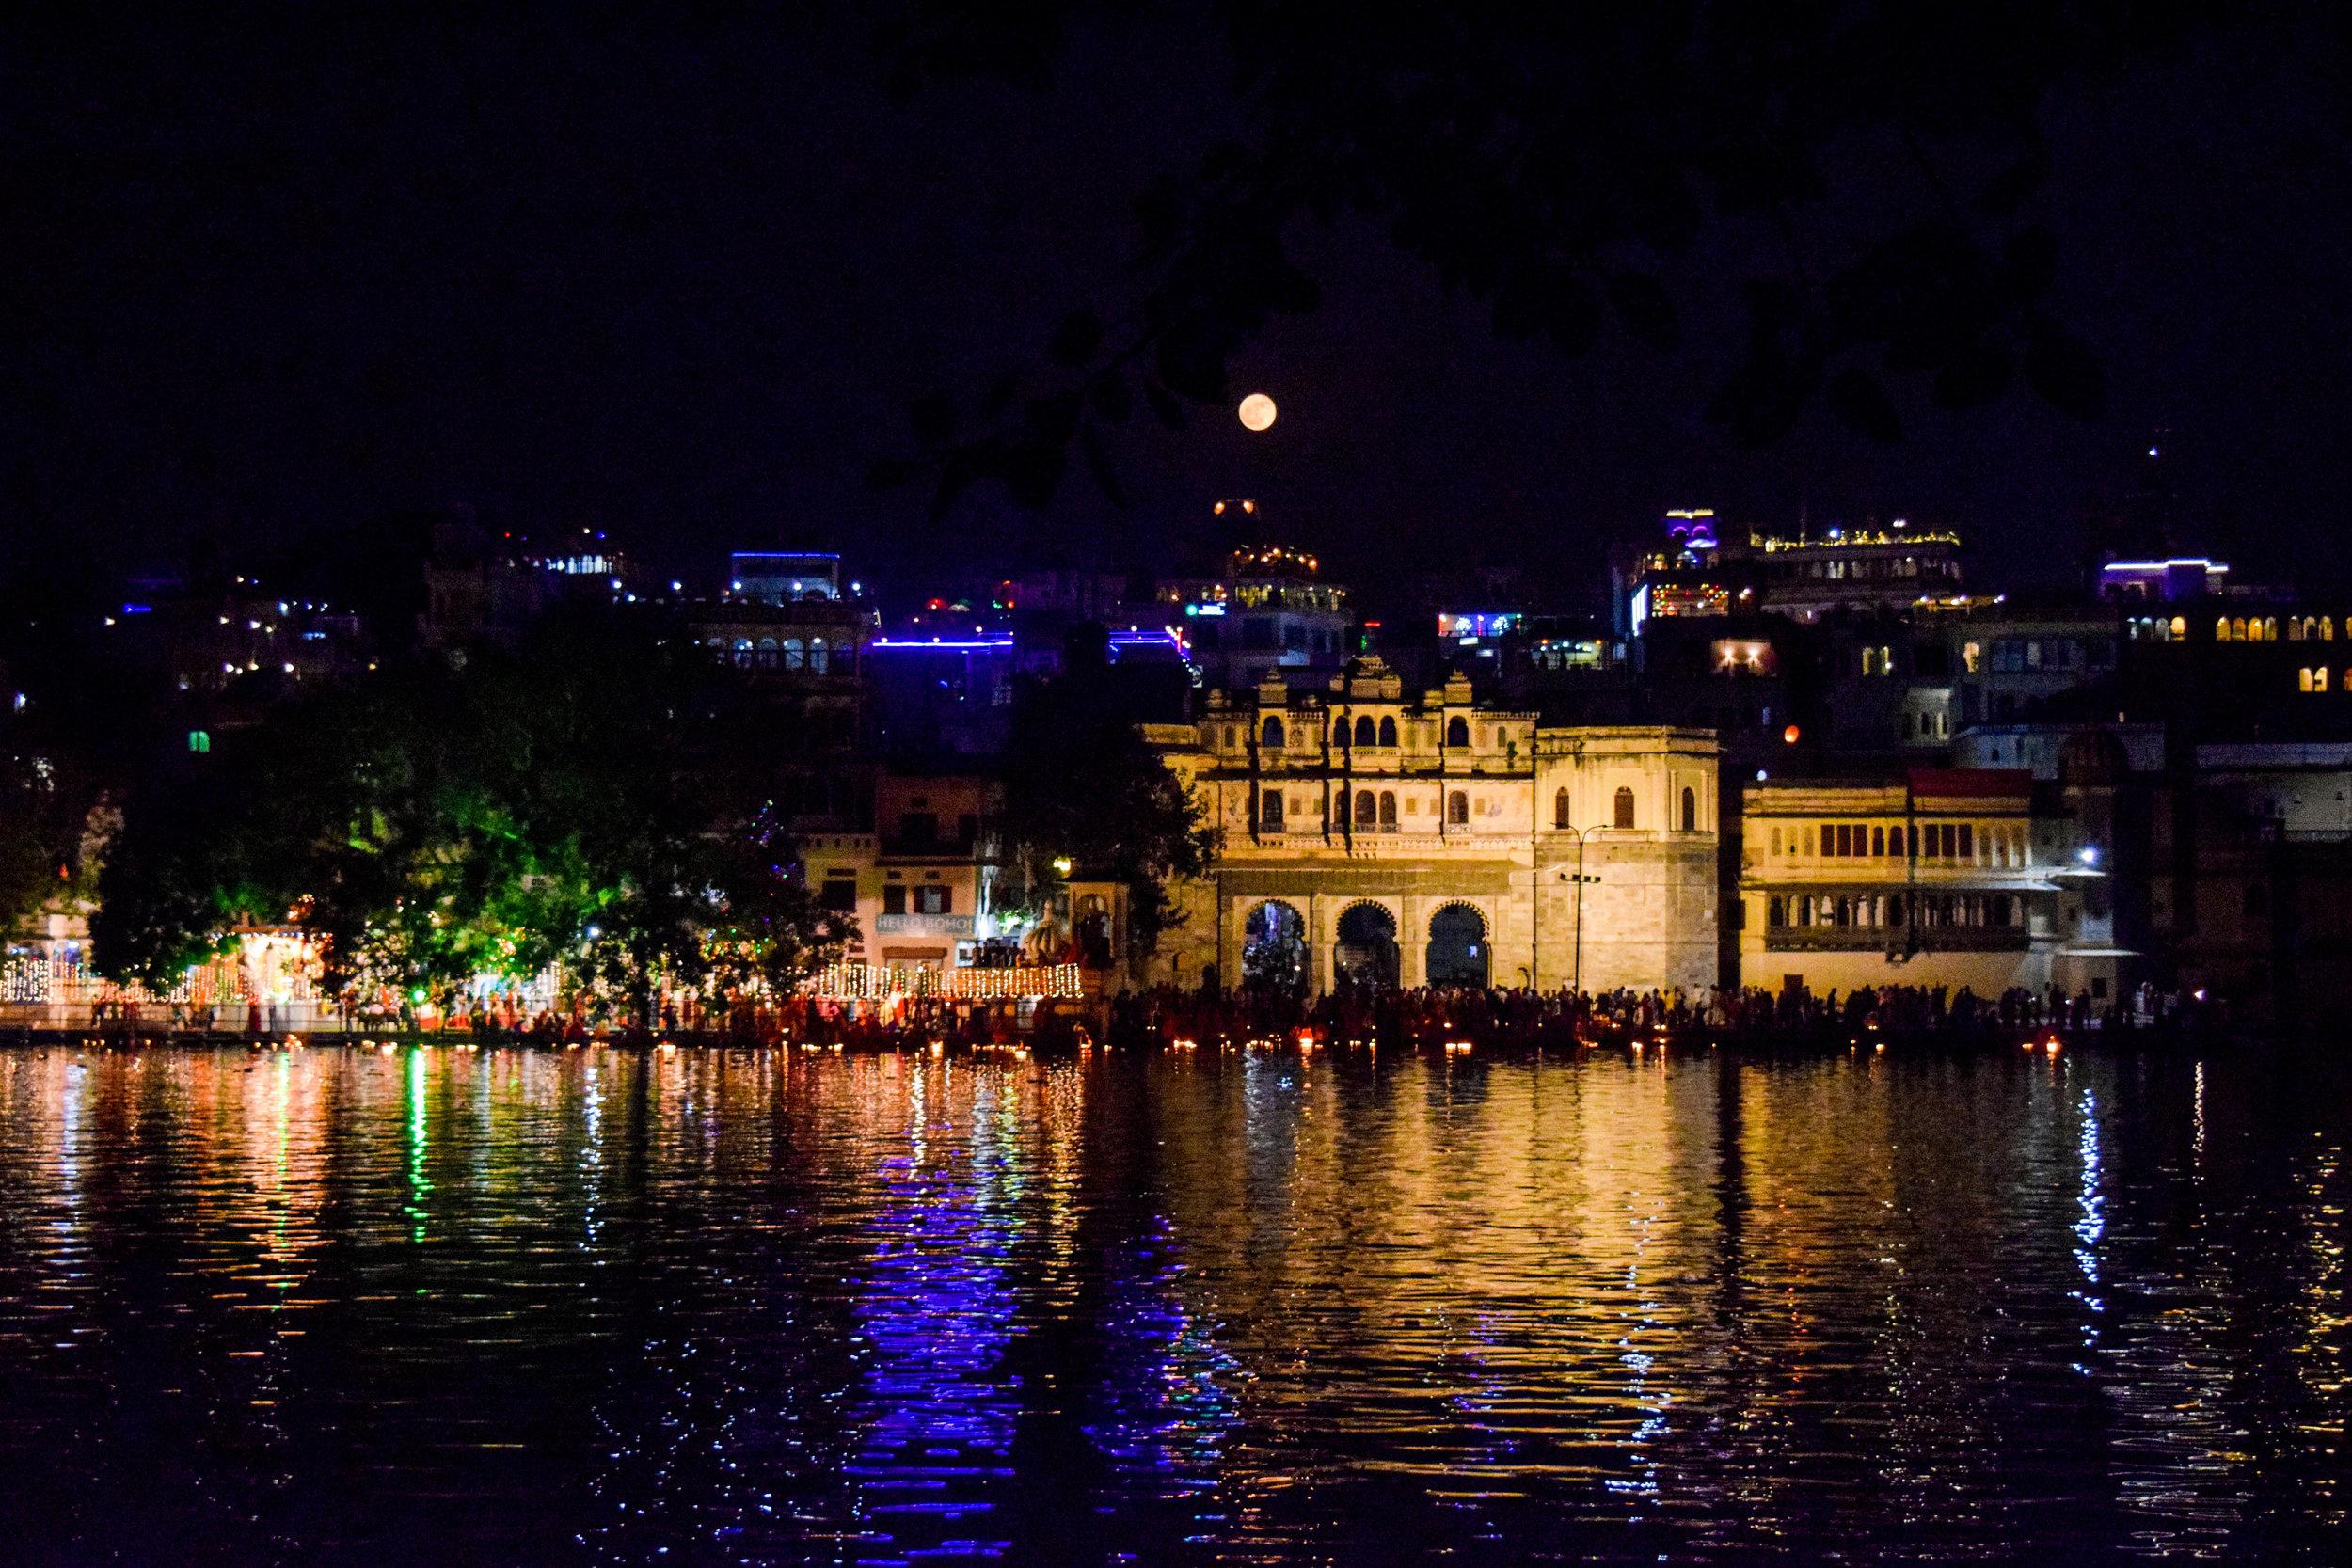 Evening lights on Lake Pichola.